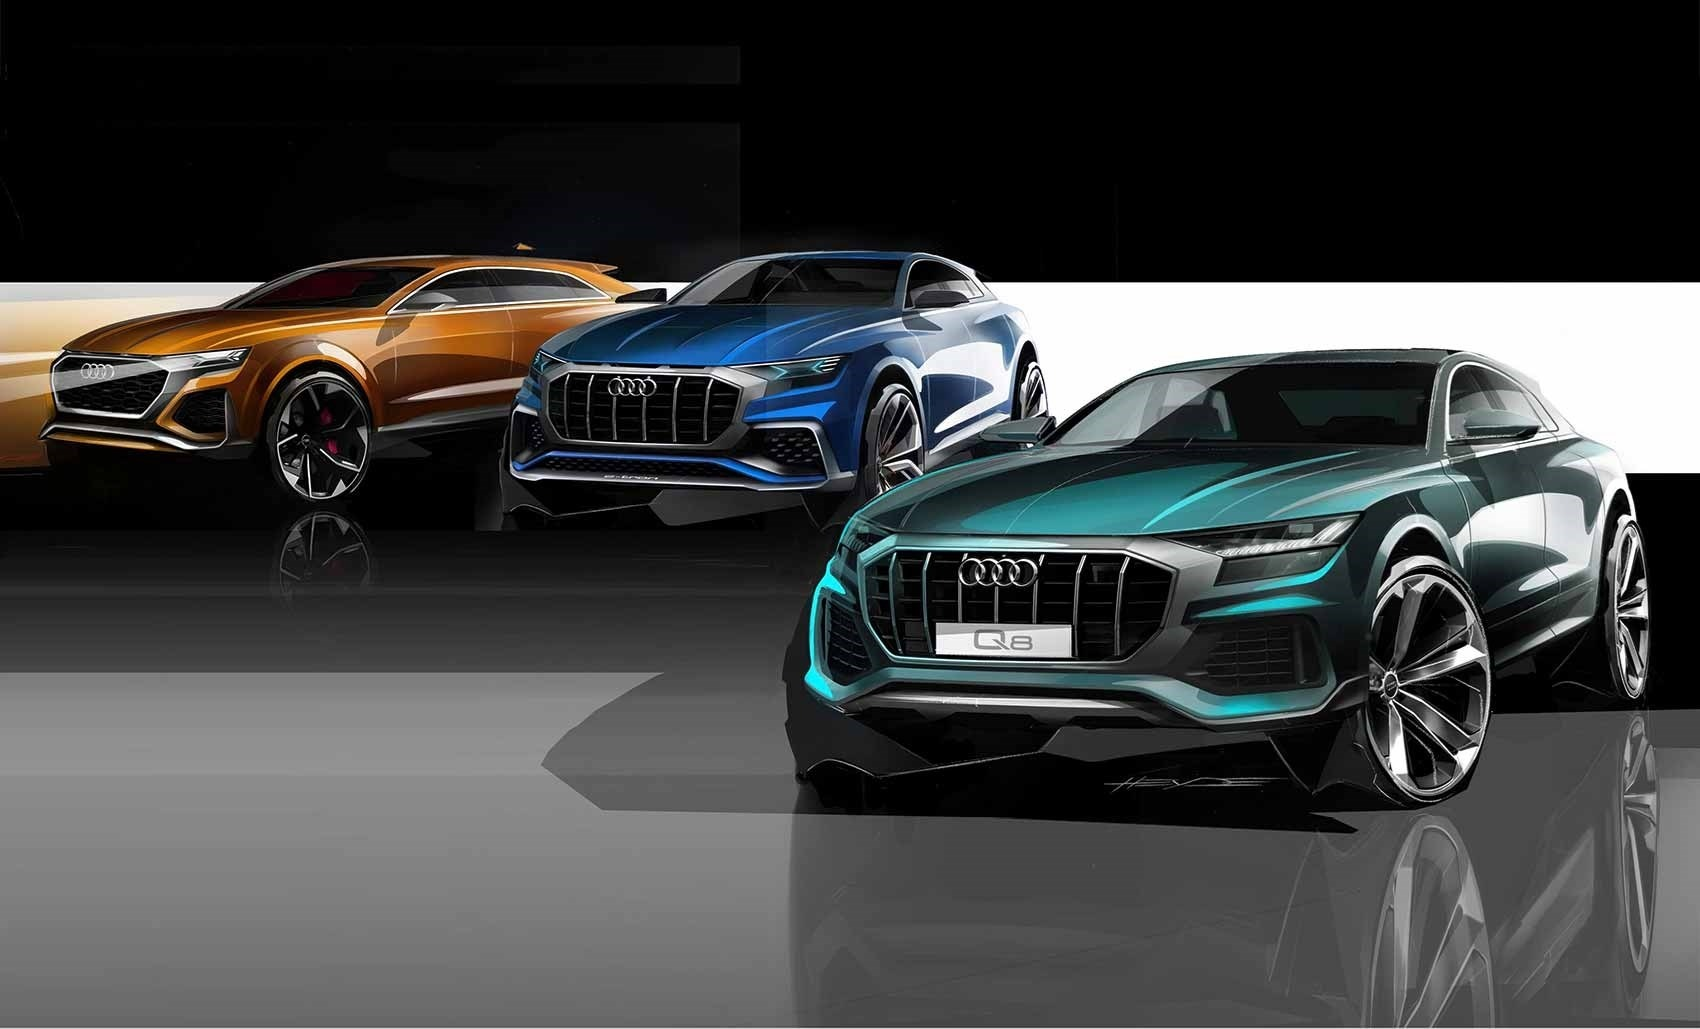 2021 Audi Q9 Wallpapers